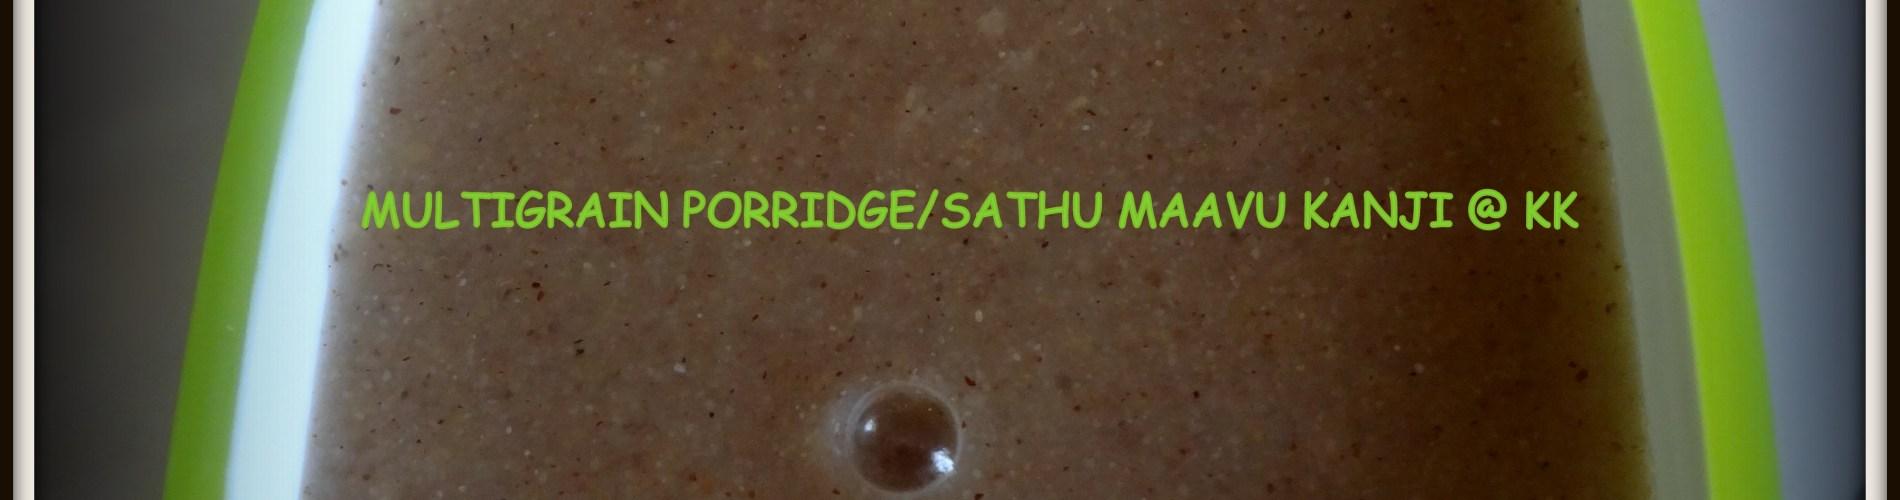 multigrainporridge